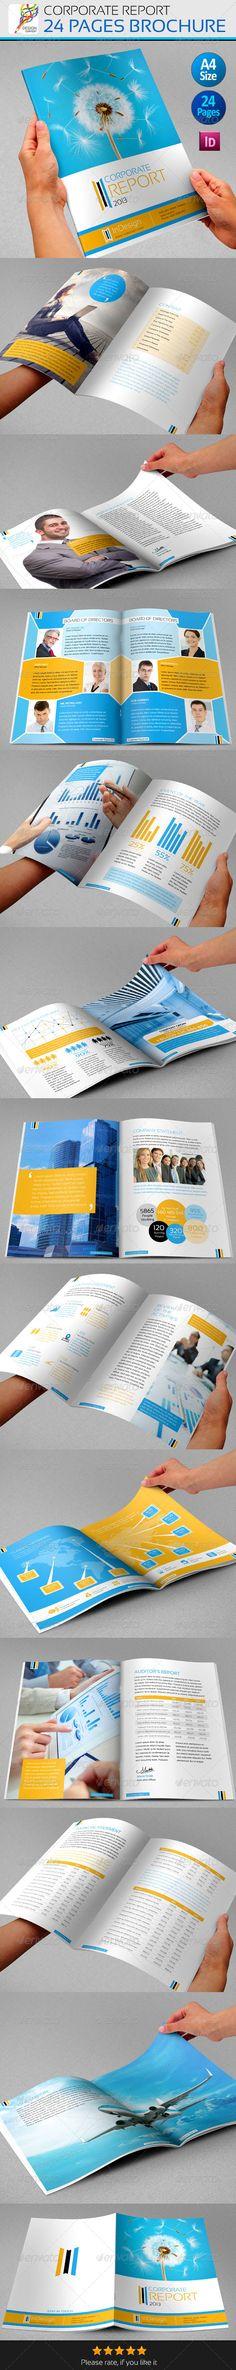 Corporate Annual Report\/ Brochure - GraphicRiver Item for Sale - free annual report templates